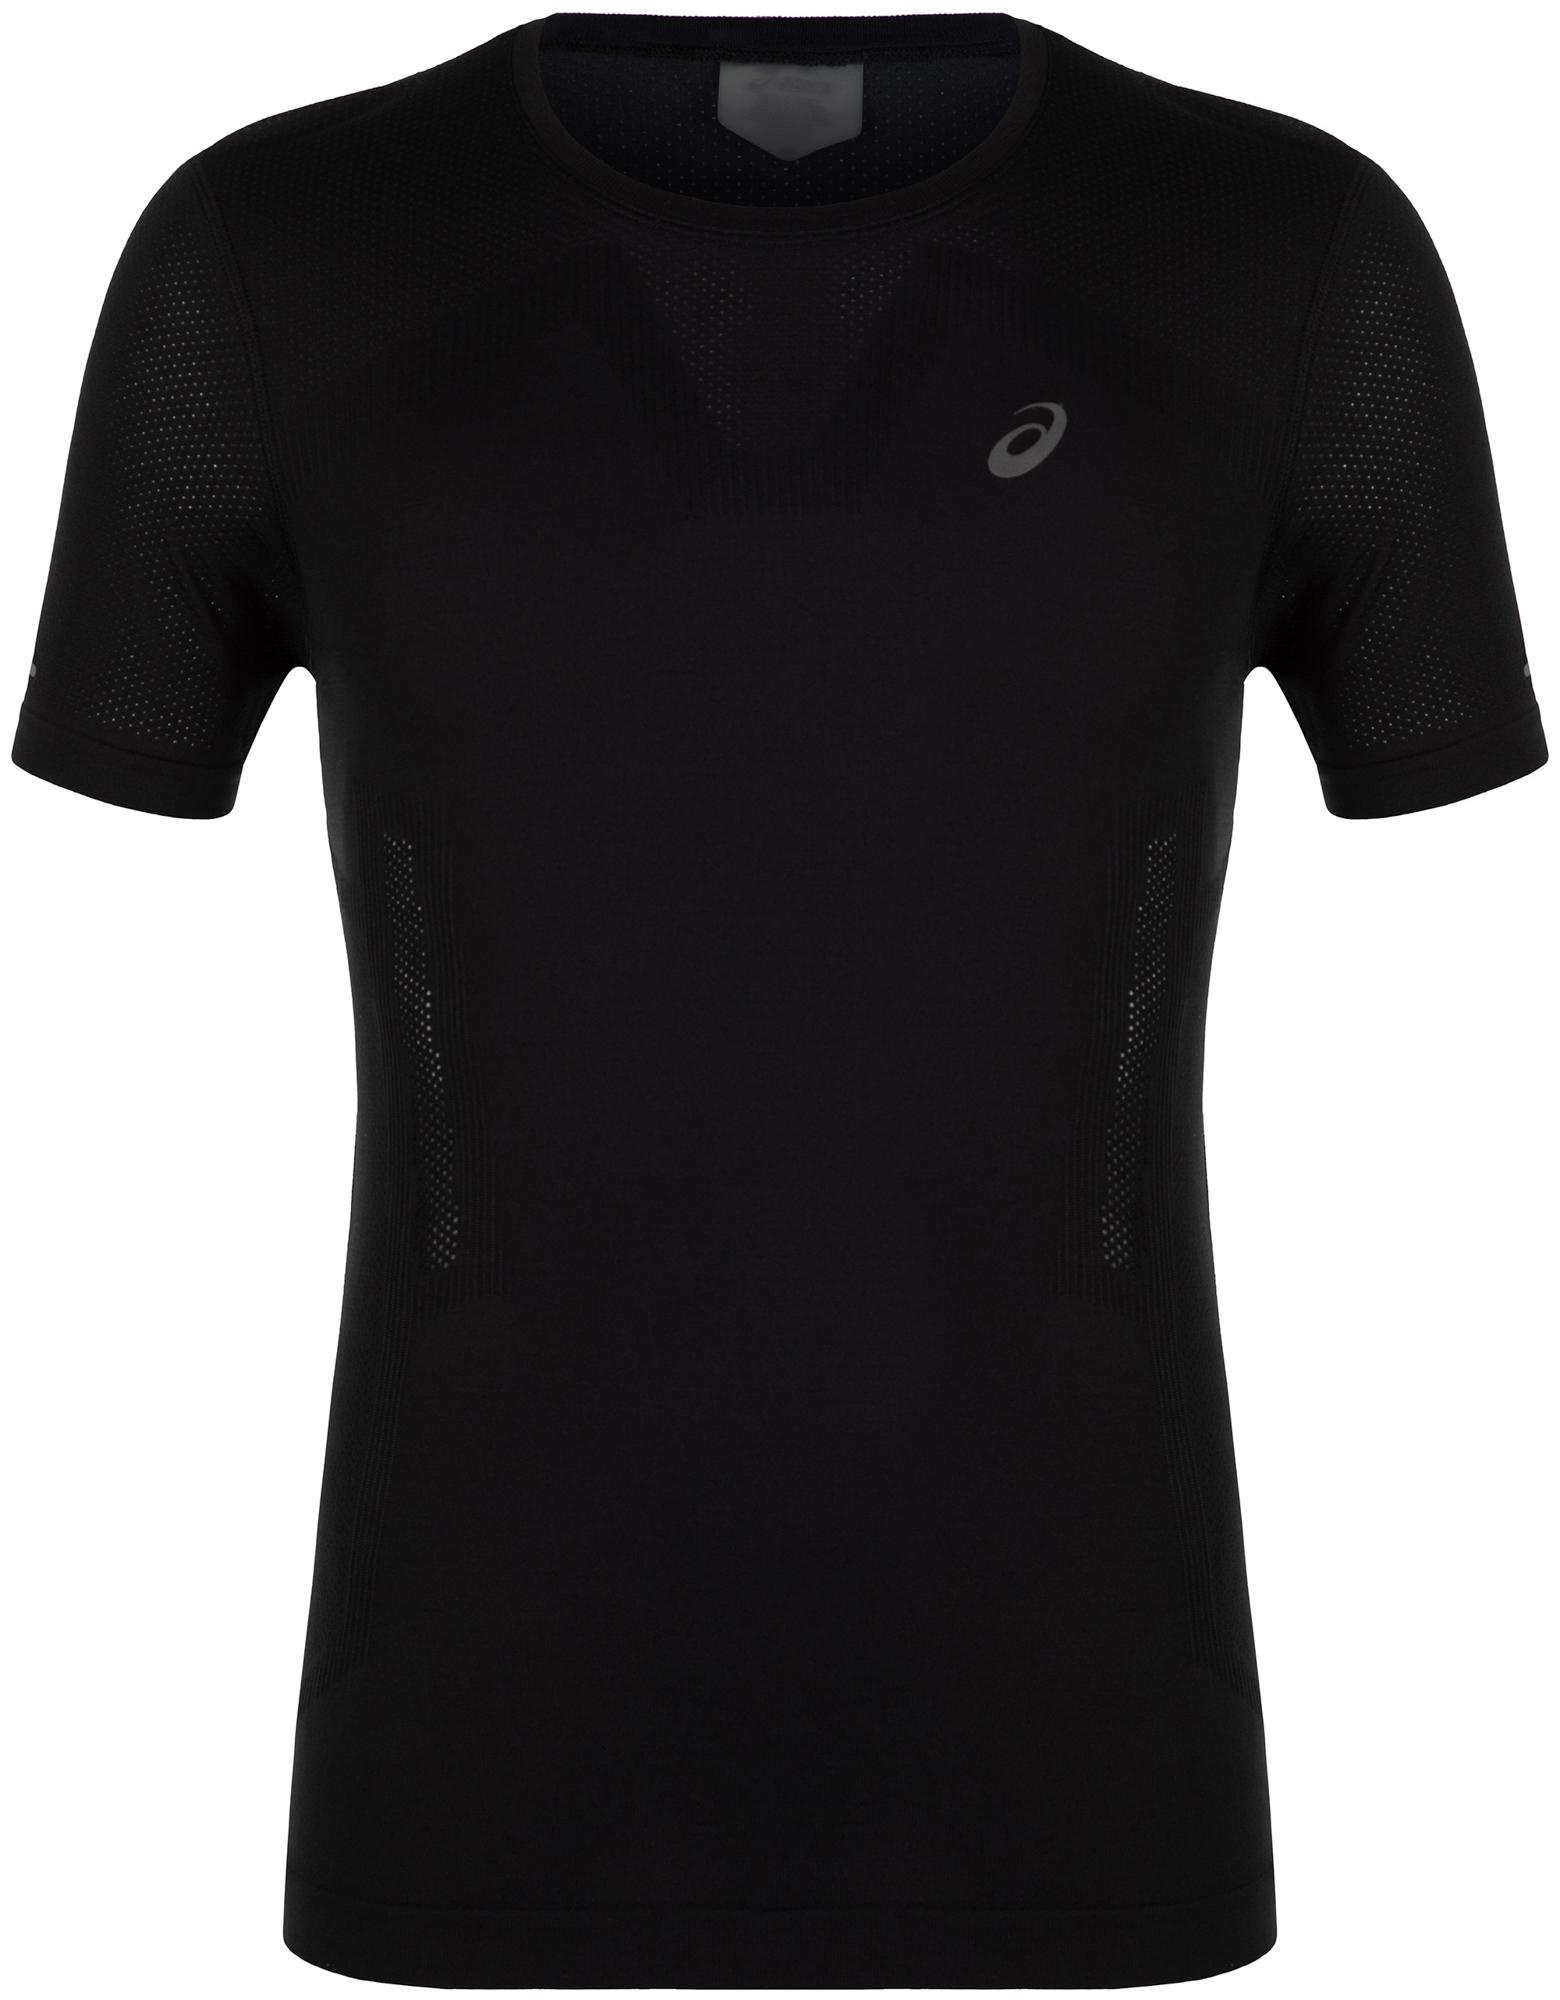 ASICS Футболка мужская ASICS Ventilate Seamless, размер 46-48 цена 2017